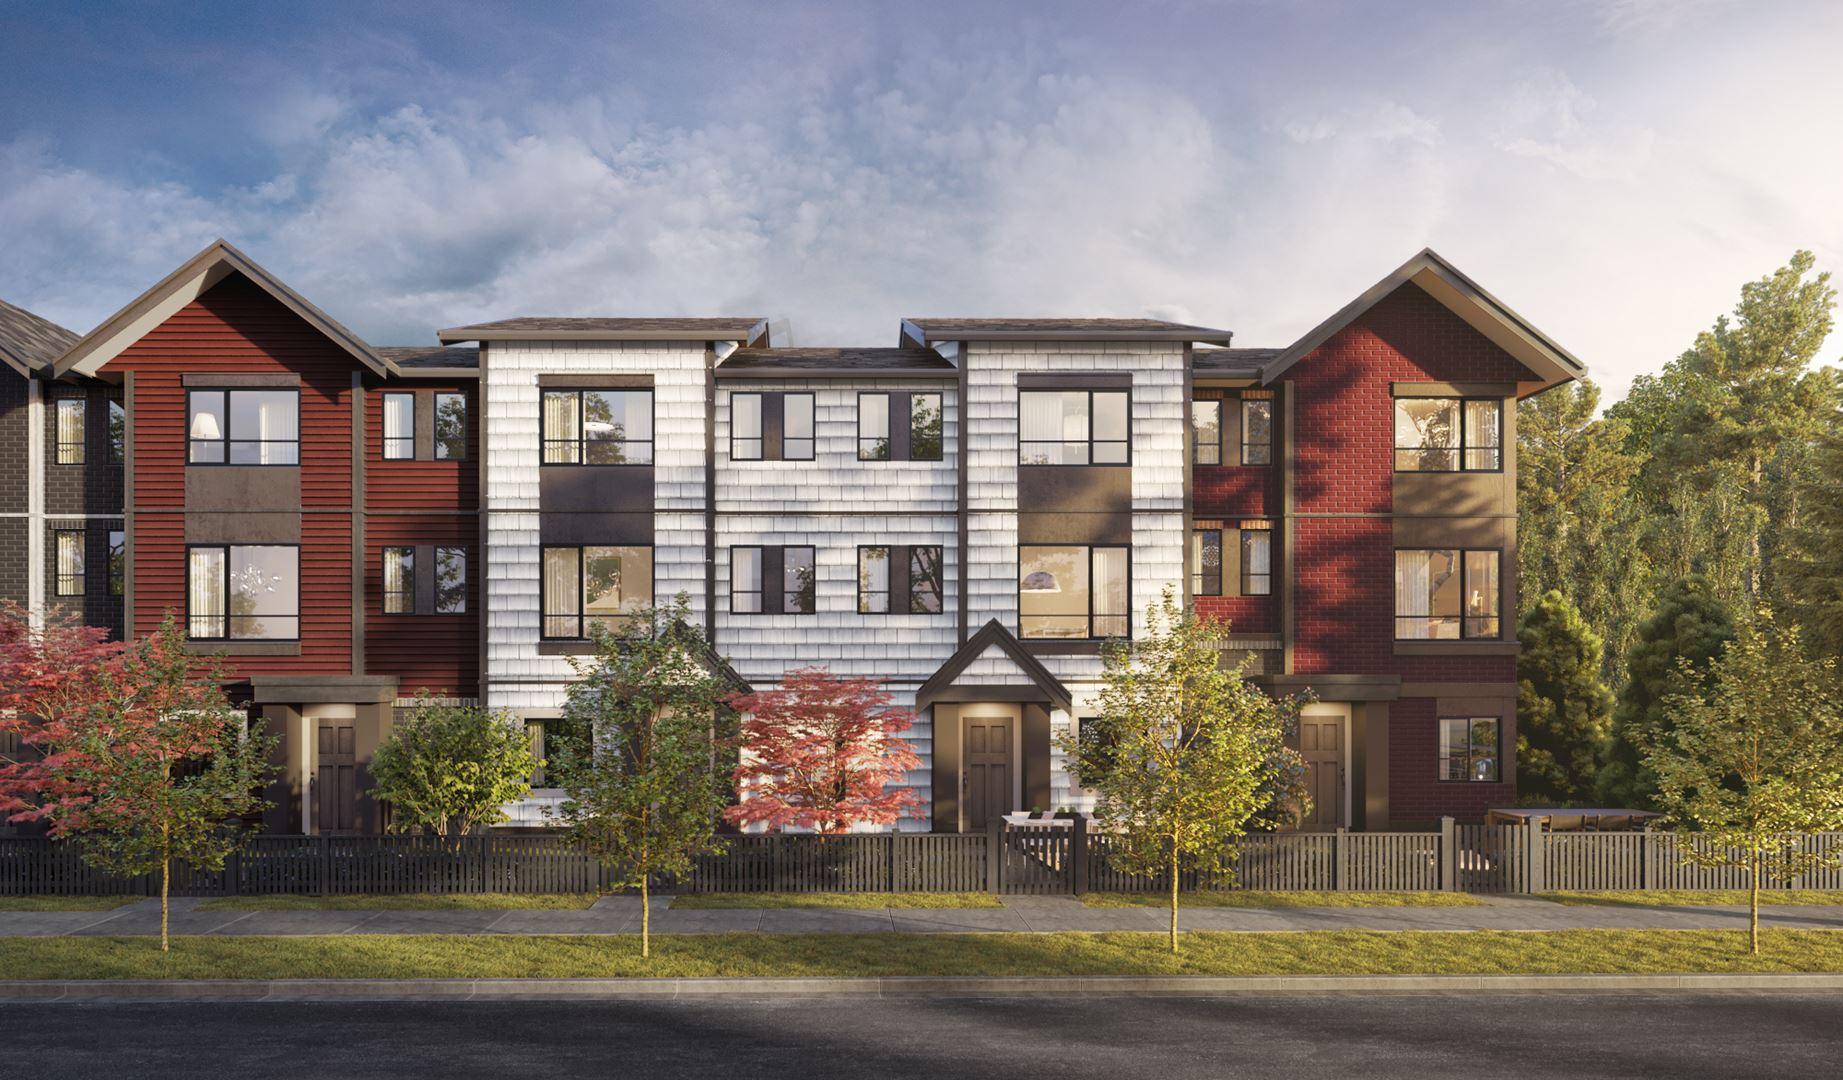 Mayfair By Zenterra Developments – Availability, Plans, Prices